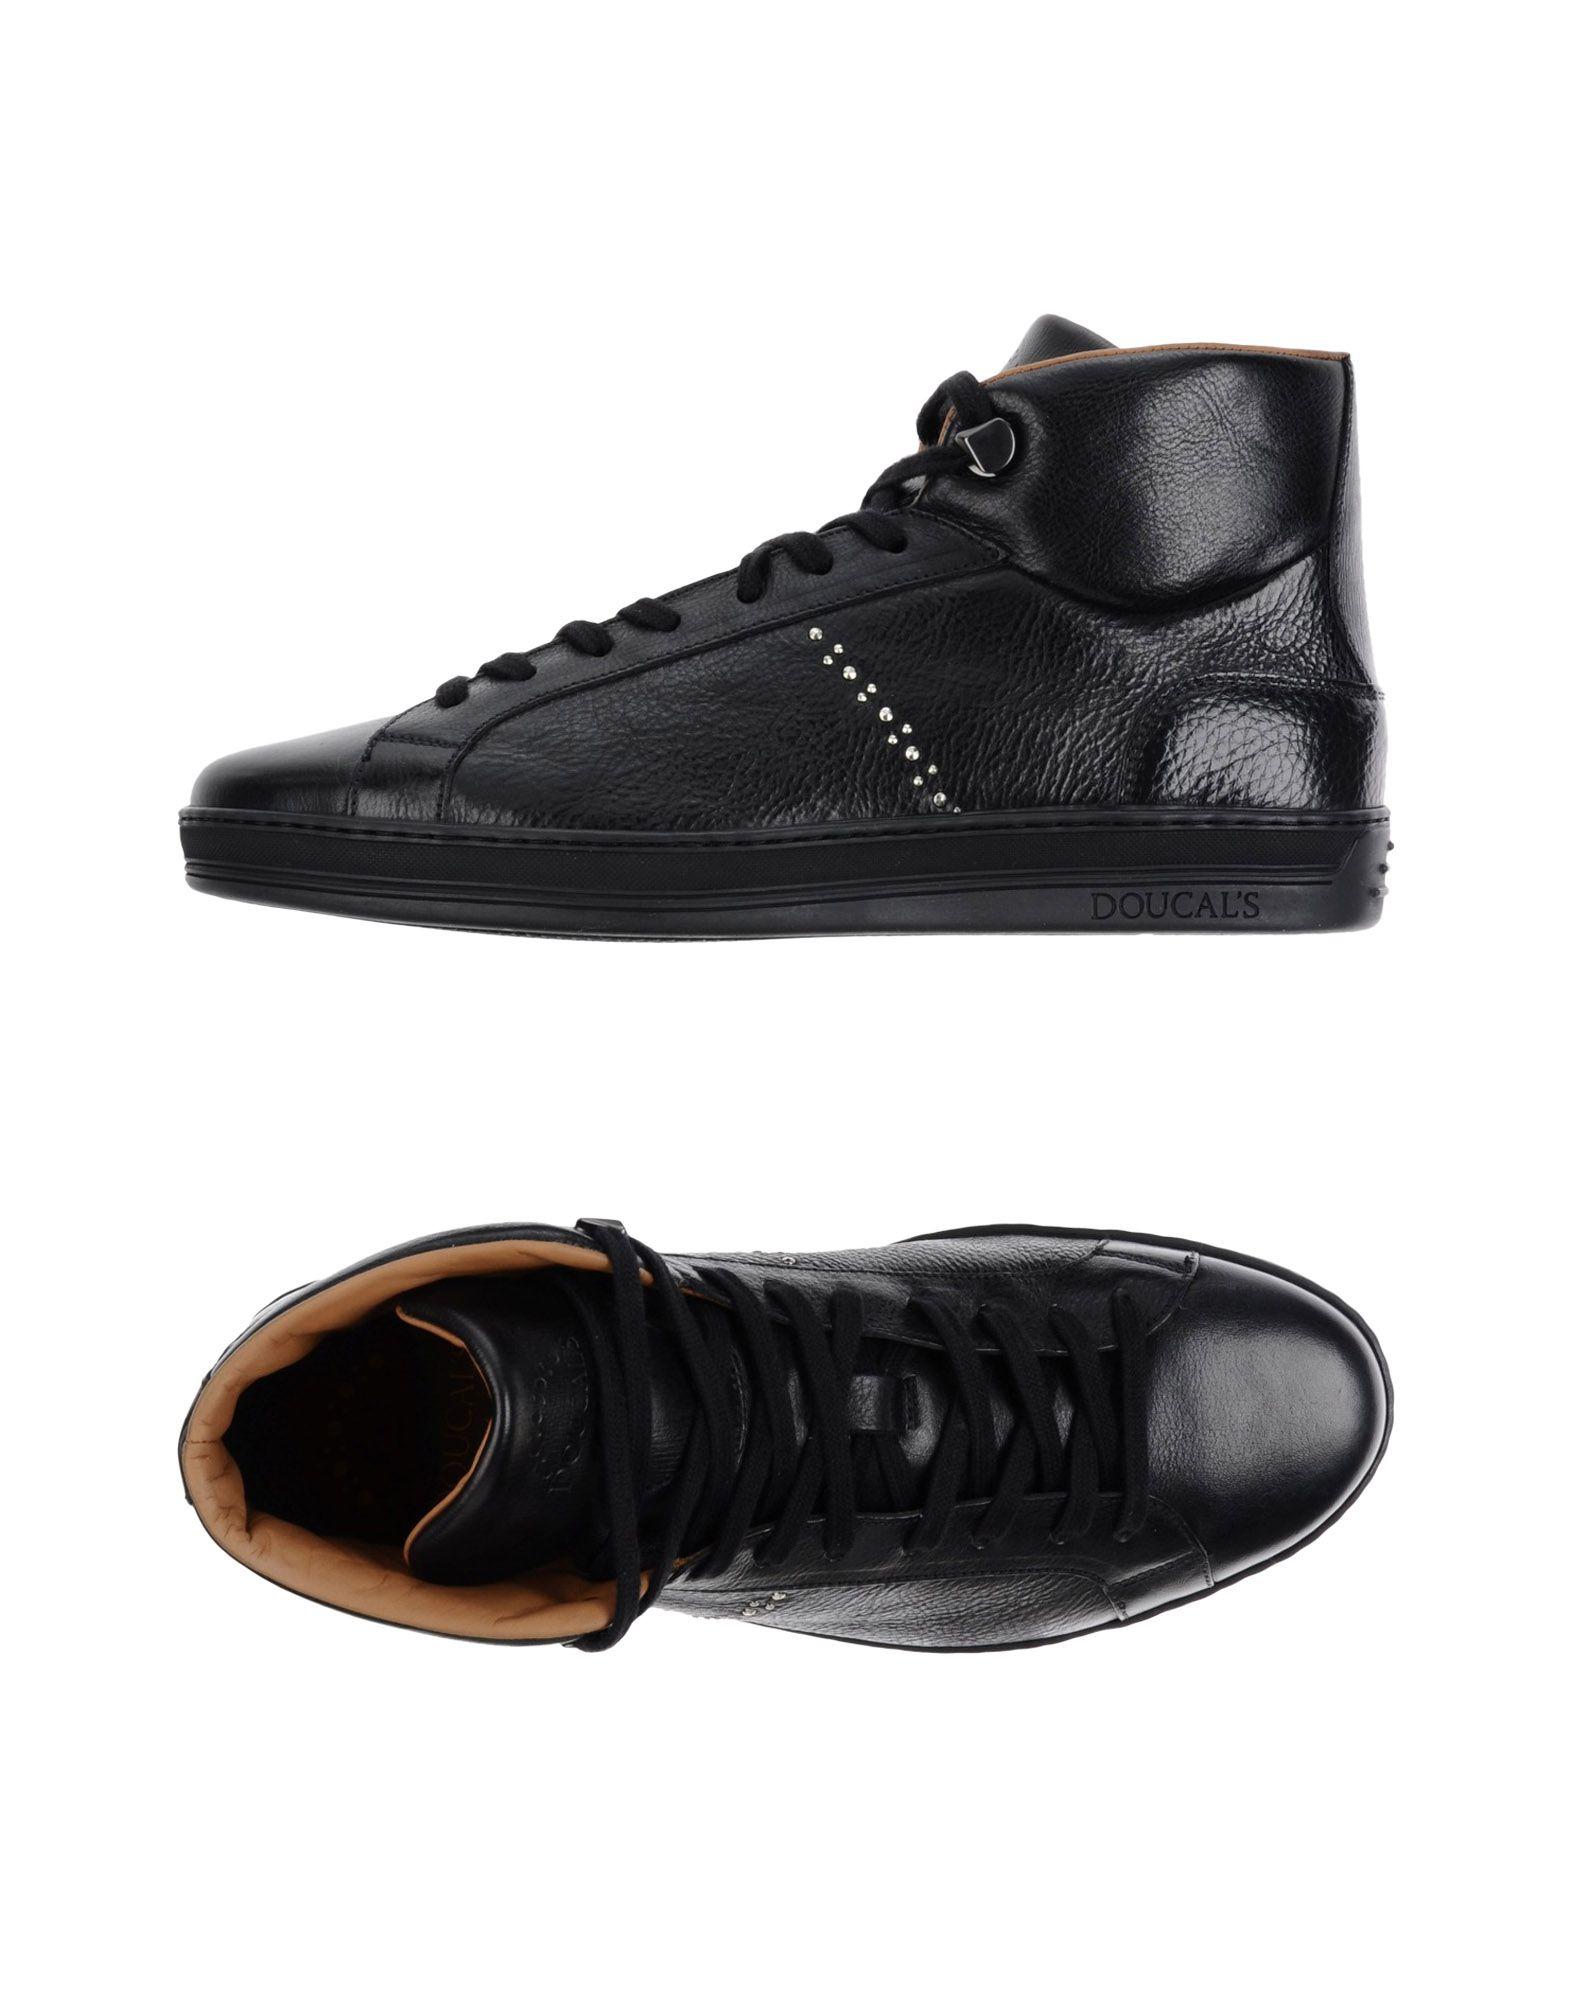 DOUCAL'S Высокие кеды и кроссовки pierre hardy высокие кеды и кроссовки